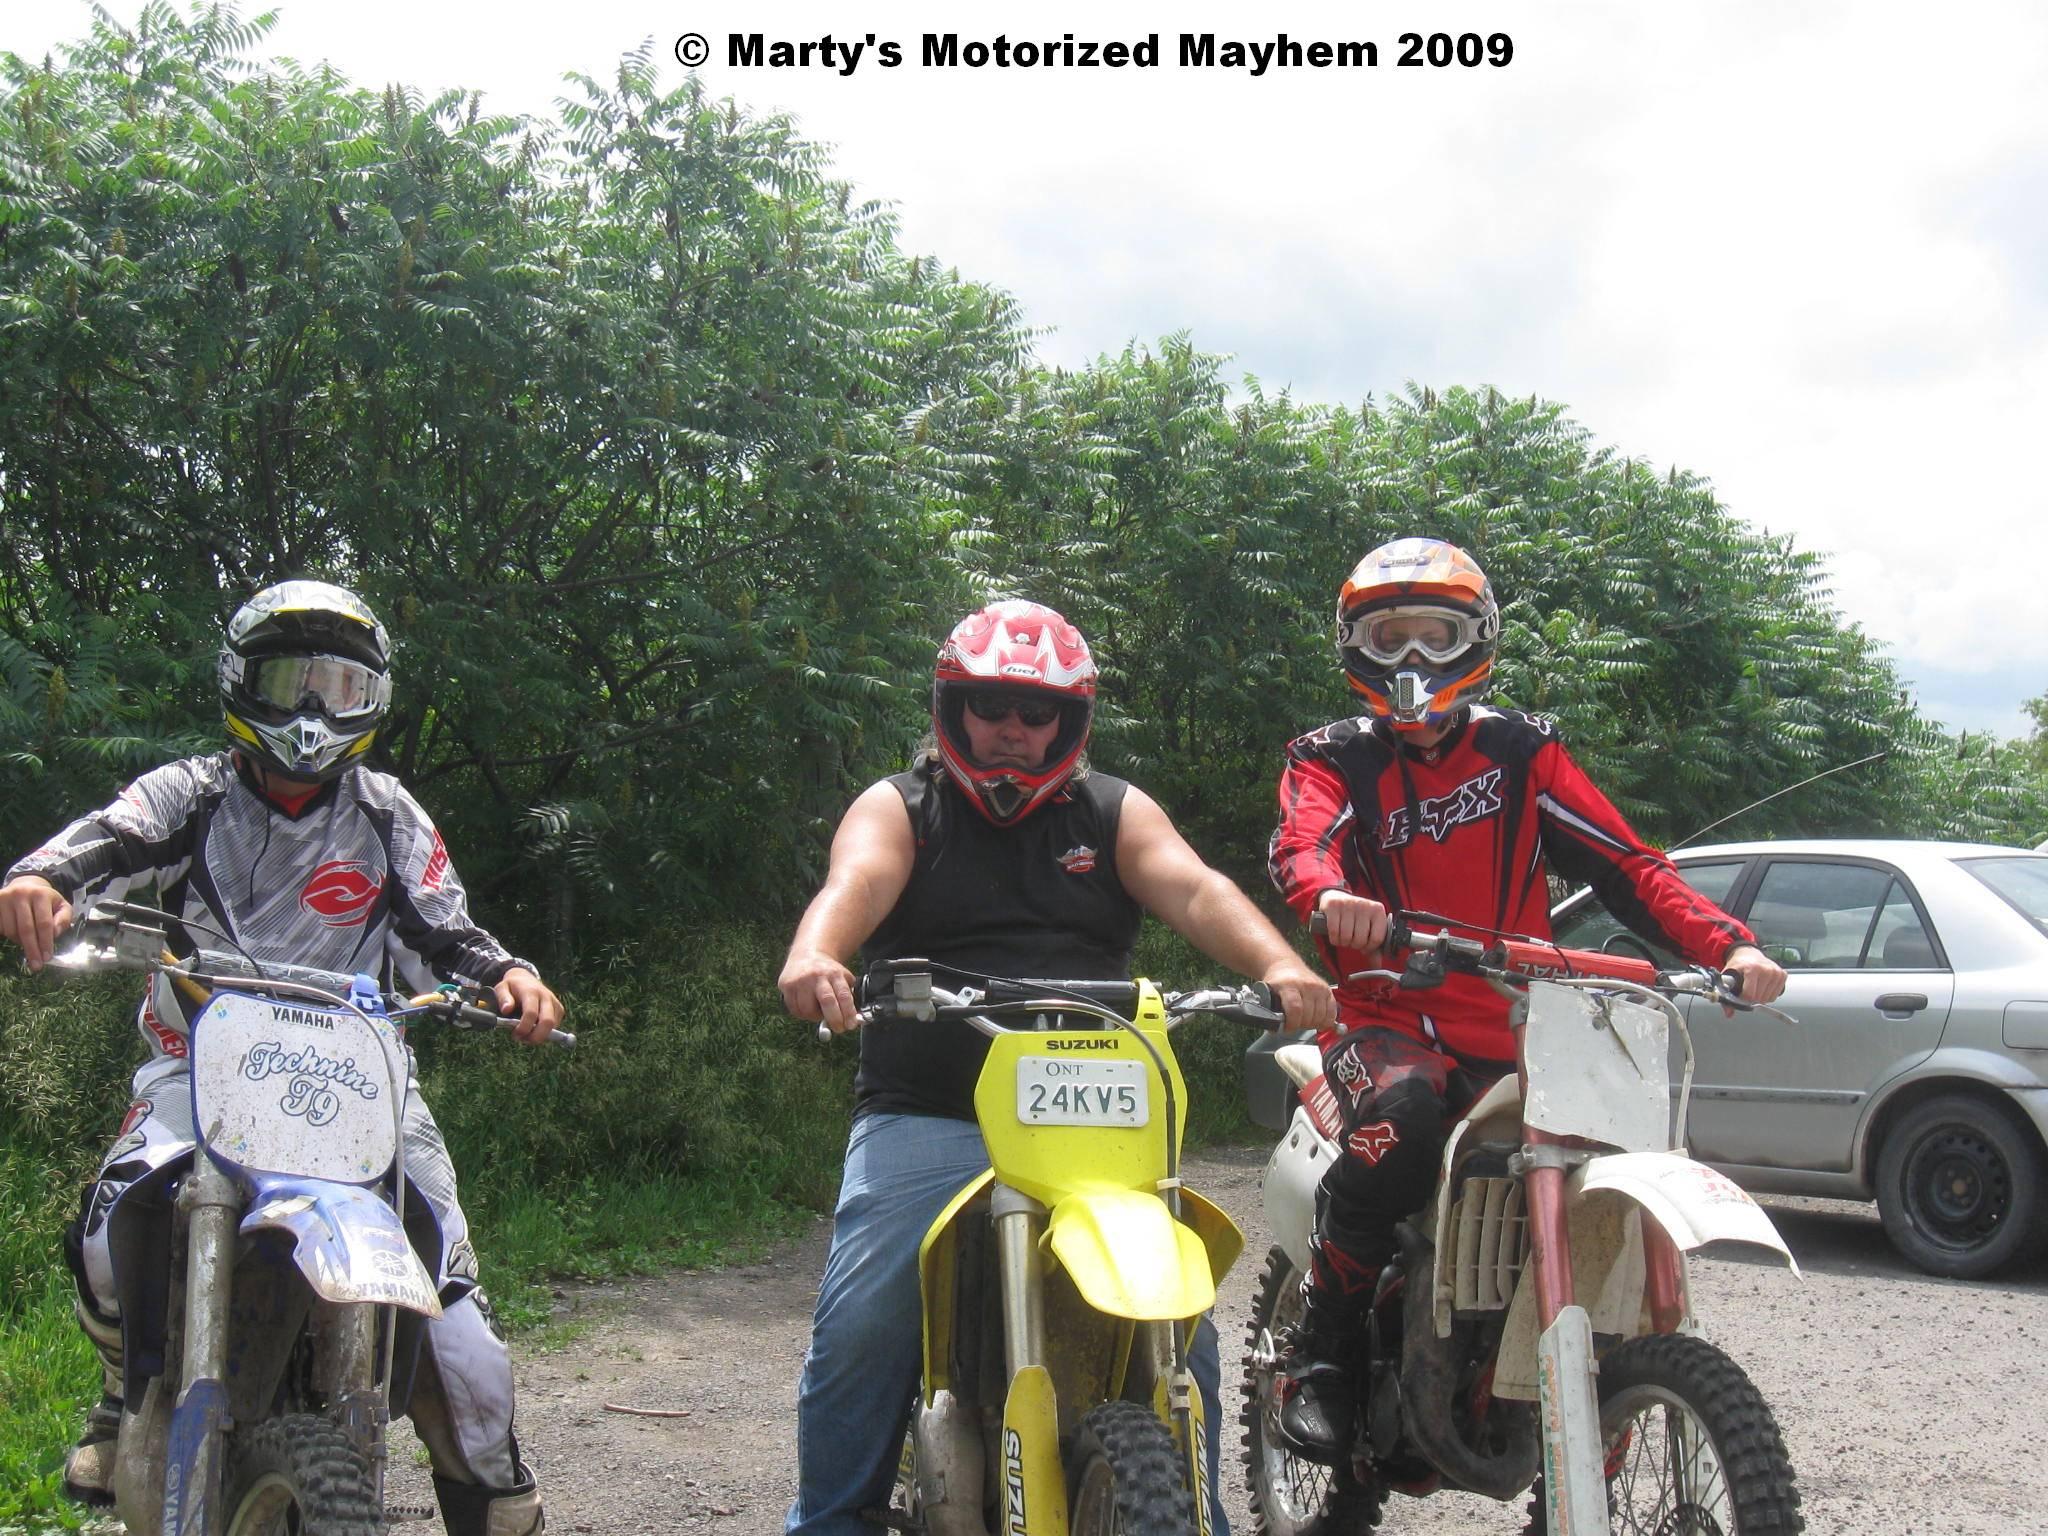 Riding July 1st 2009